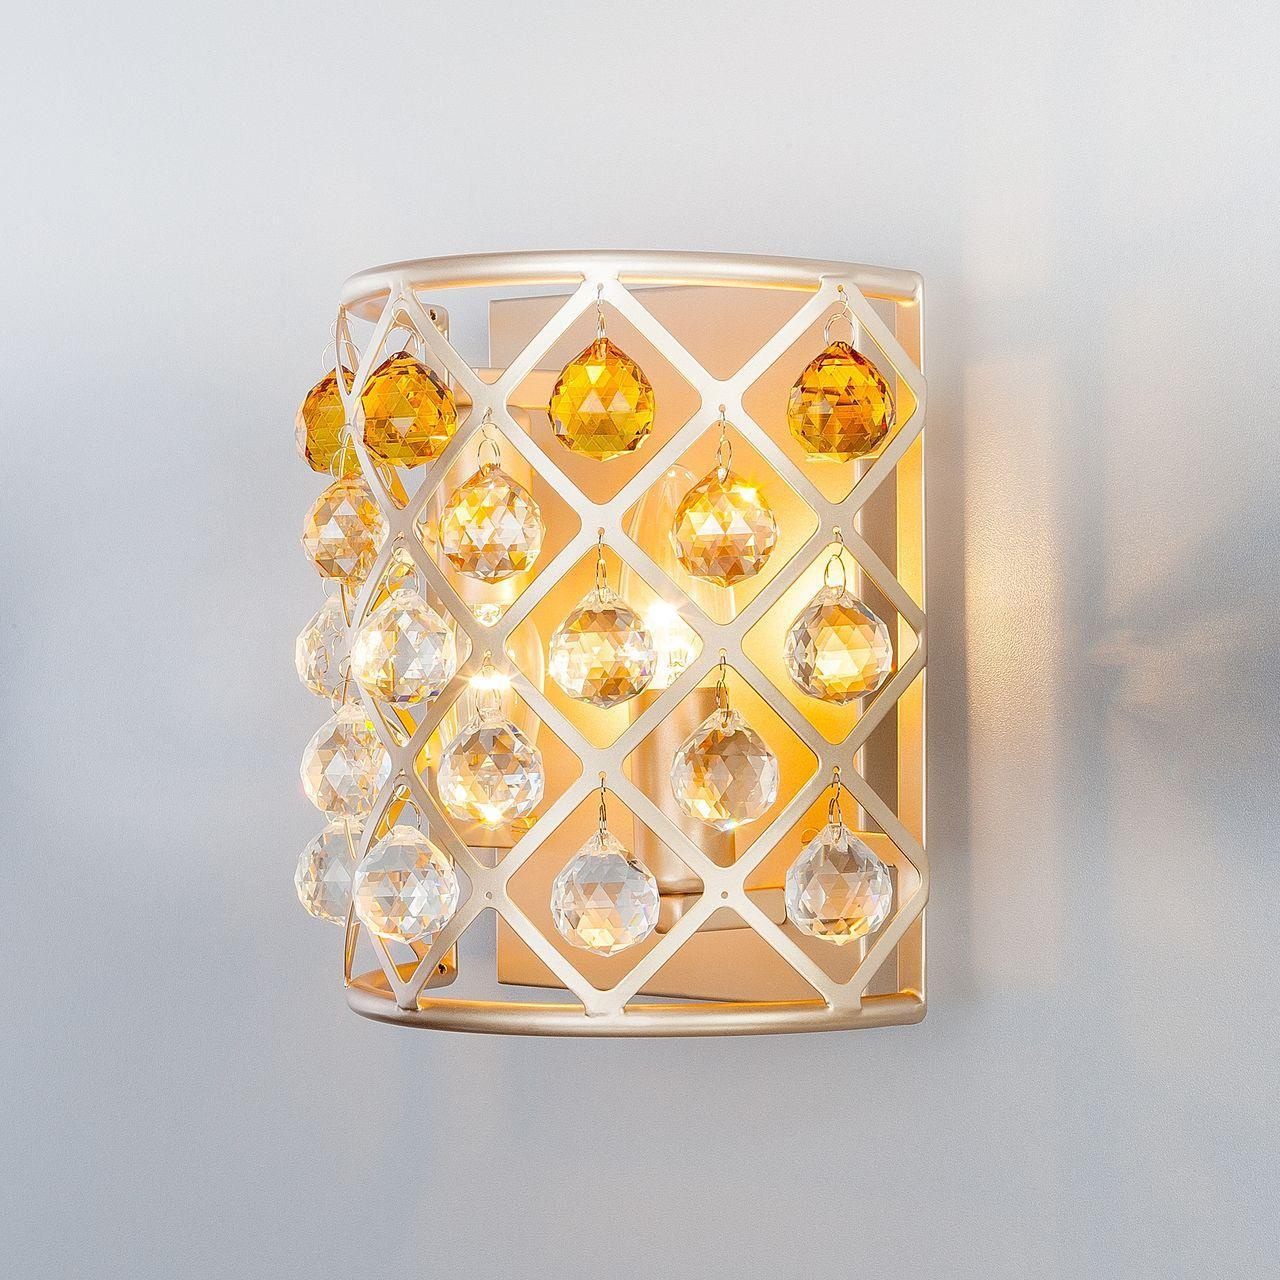 Настенный светильник Bogates 307/2 Strotskis, E14, 60 Вт цены